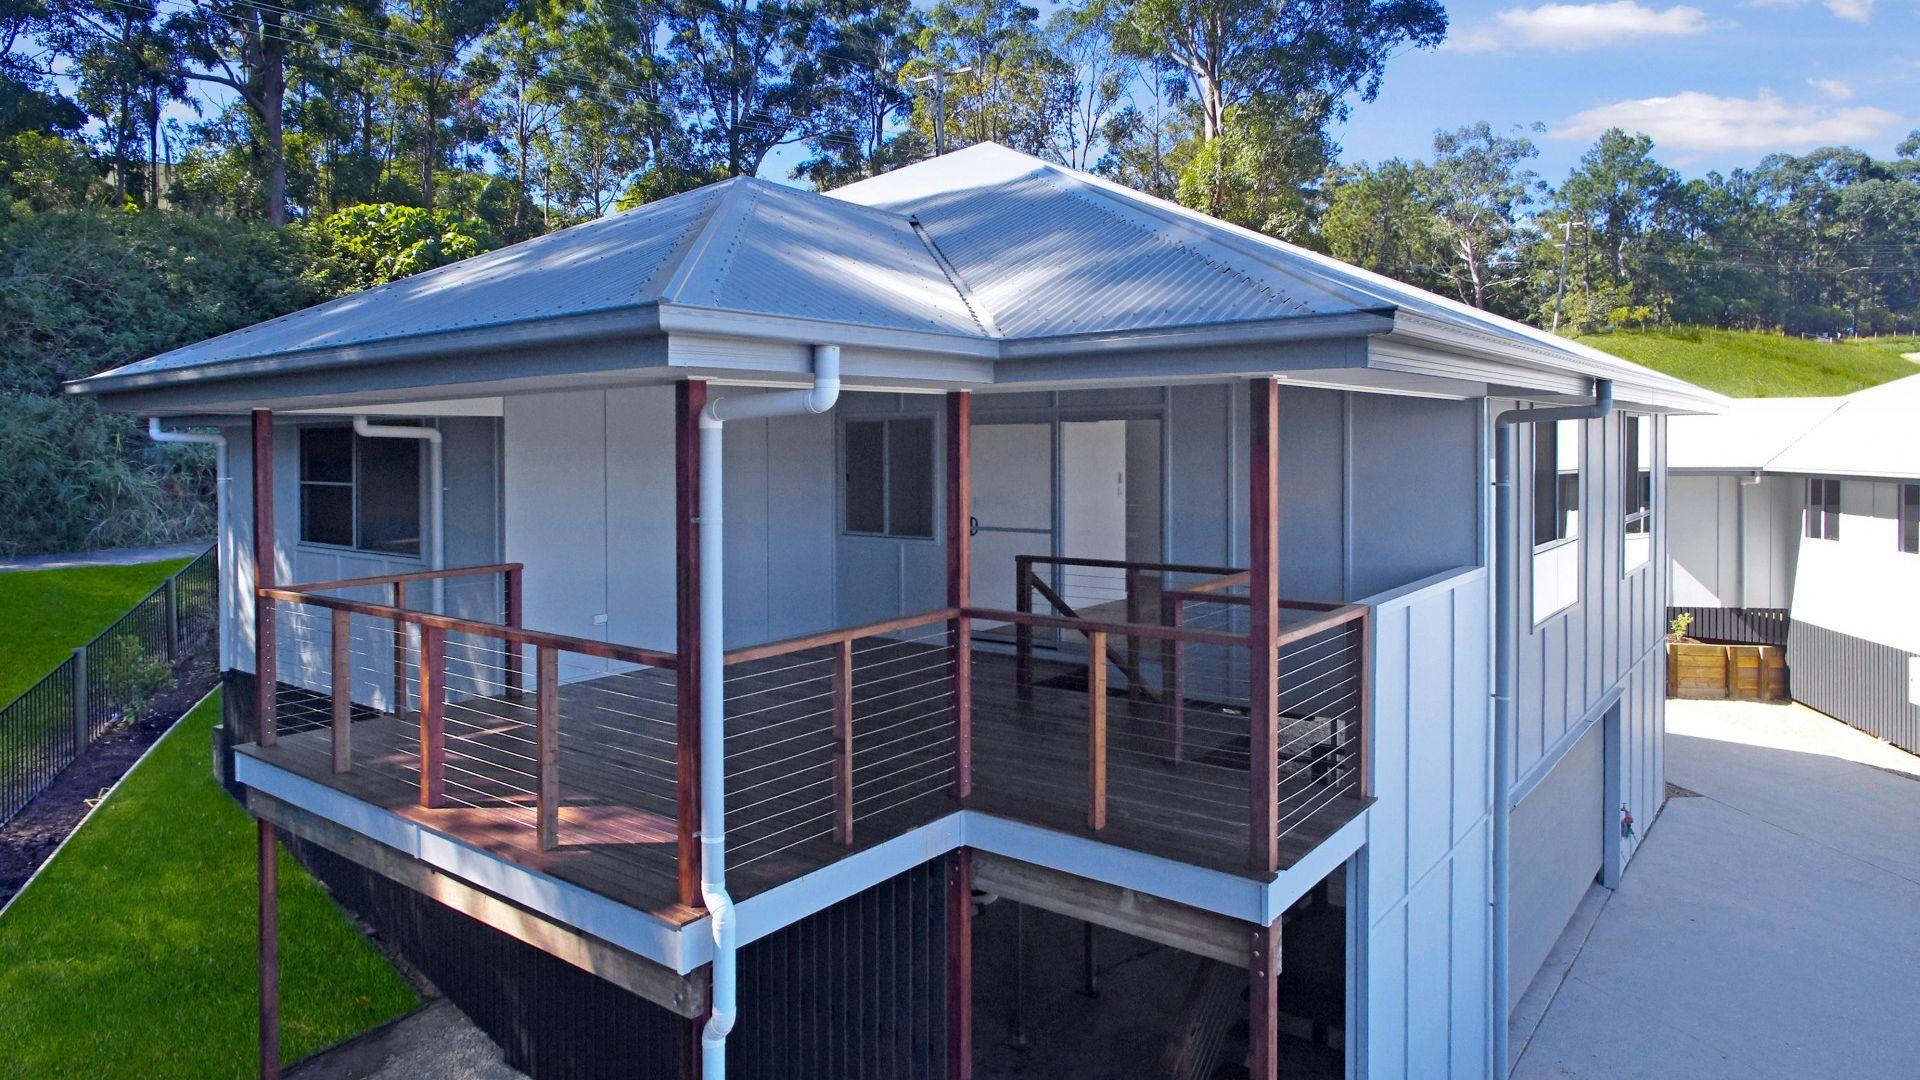 2/93 Plantation Rise Drive, Woombye QLD 4559, Image 1